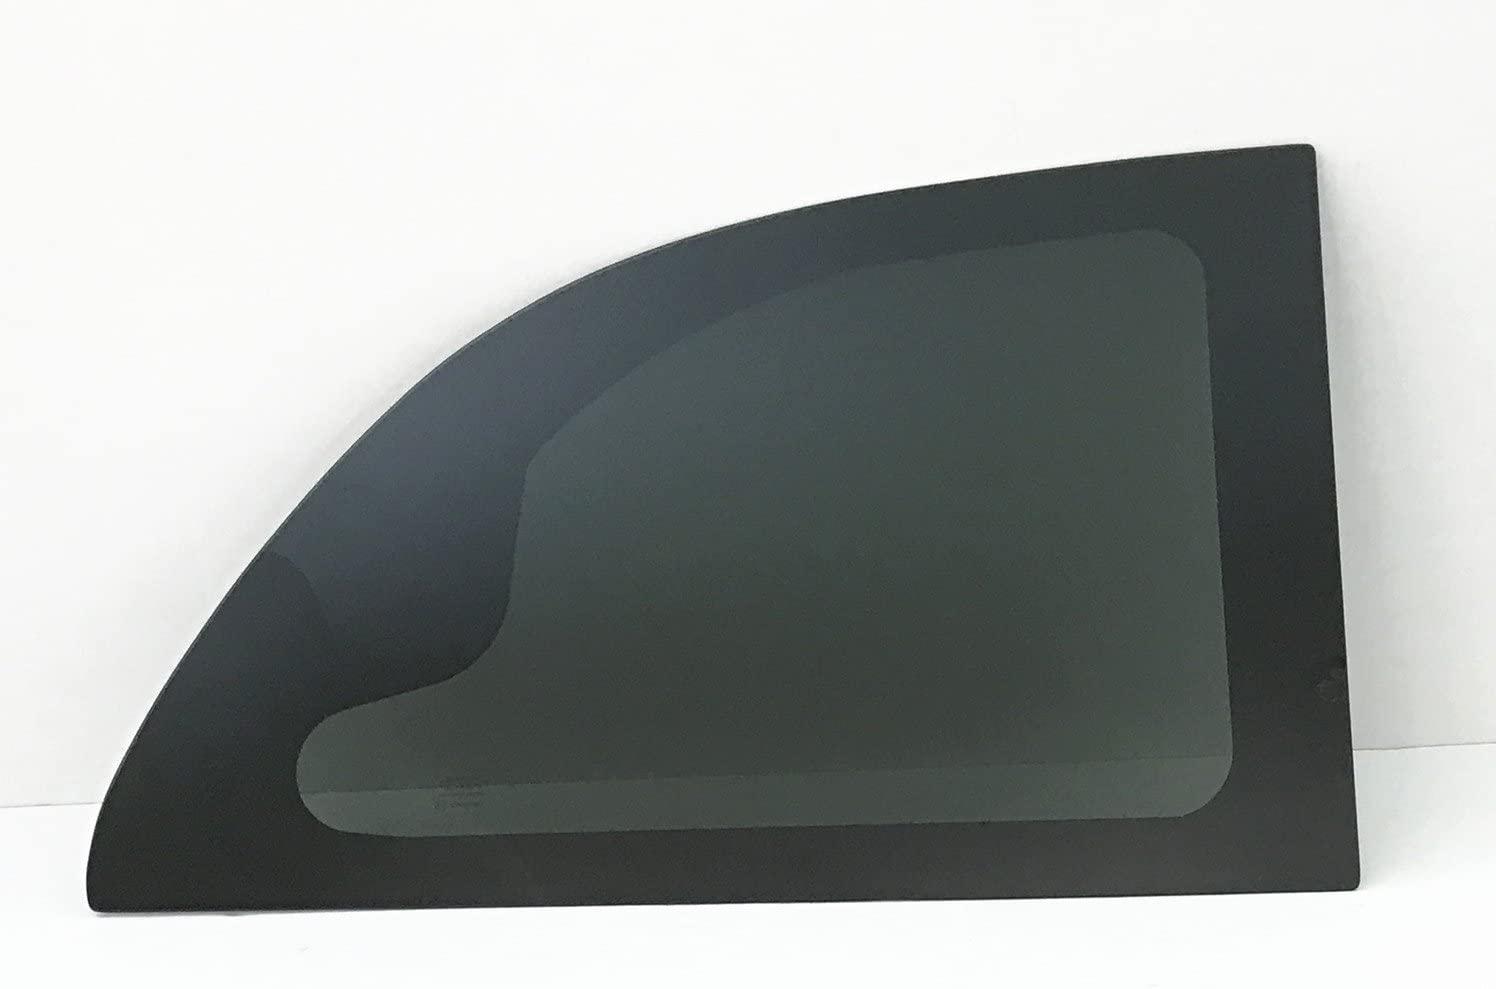 NAGD Manual Style Passenger Right Side Quarter Window Quarter Glass Compatible with Dodge Caravan 2001-2007 Models